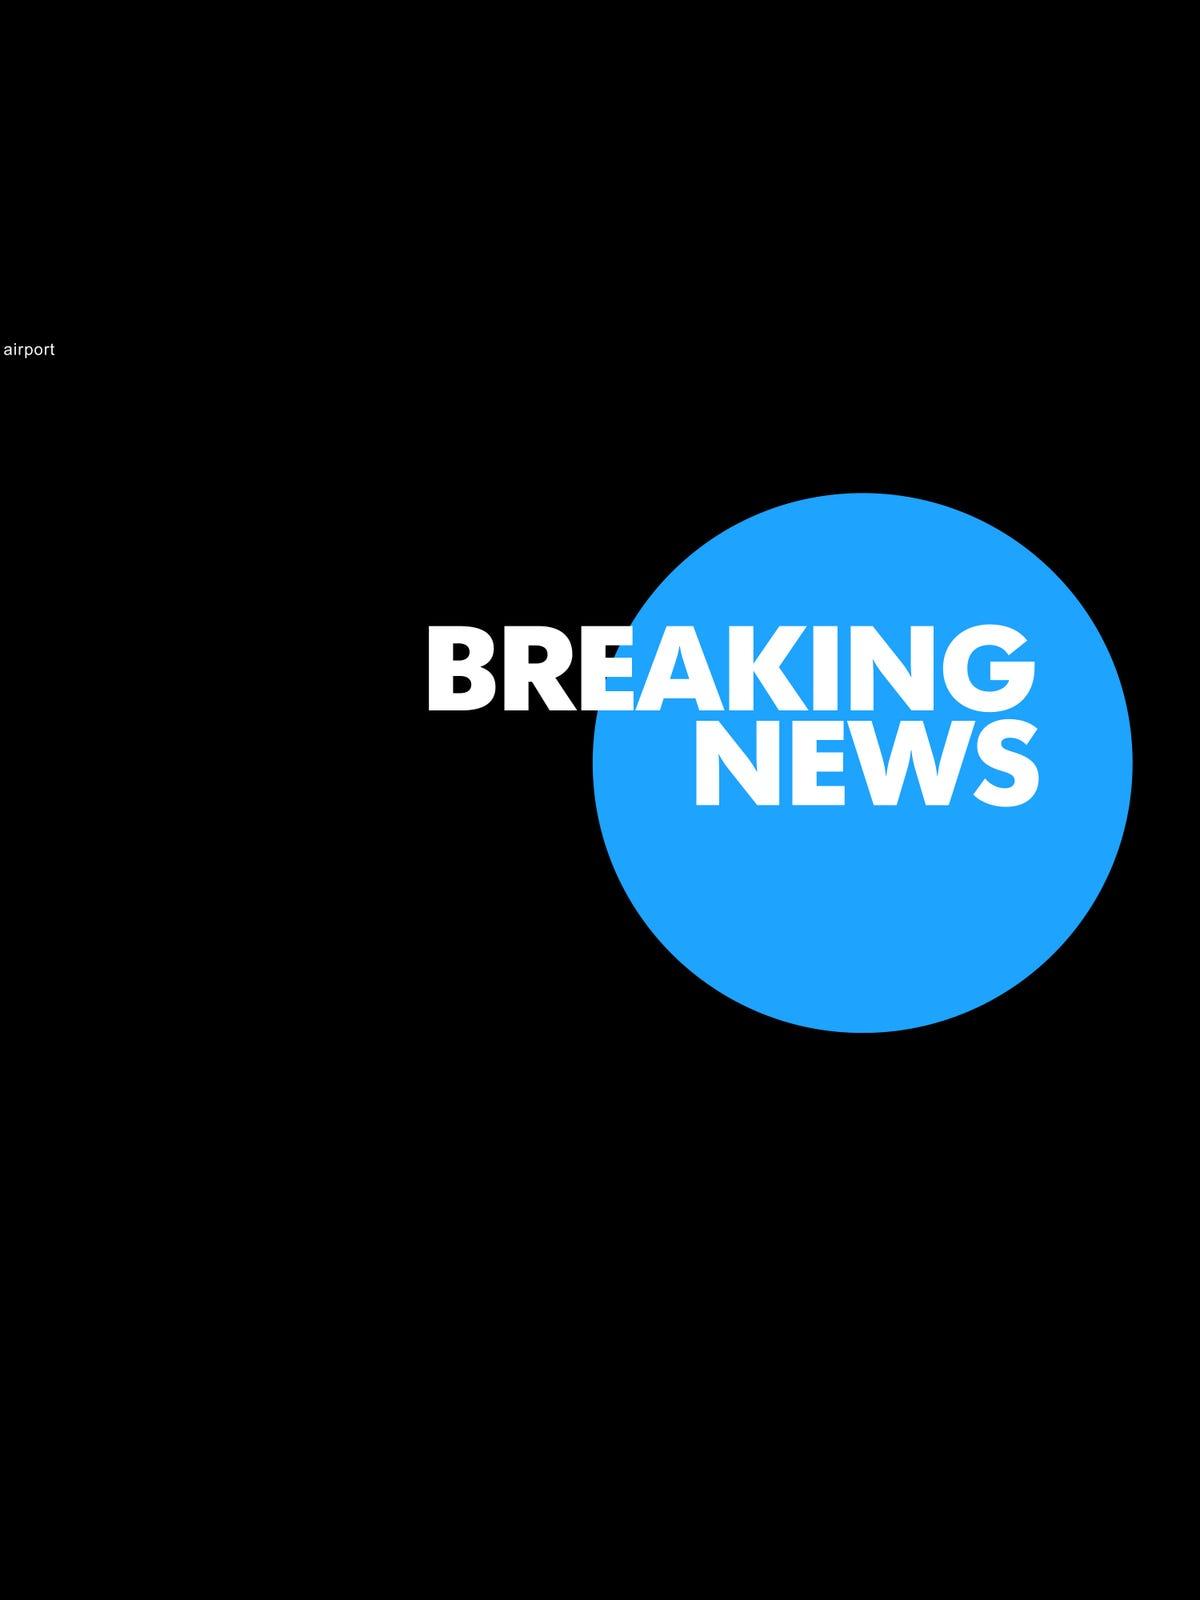 Lion attack: Worker killed after lion escapes in North Carolina